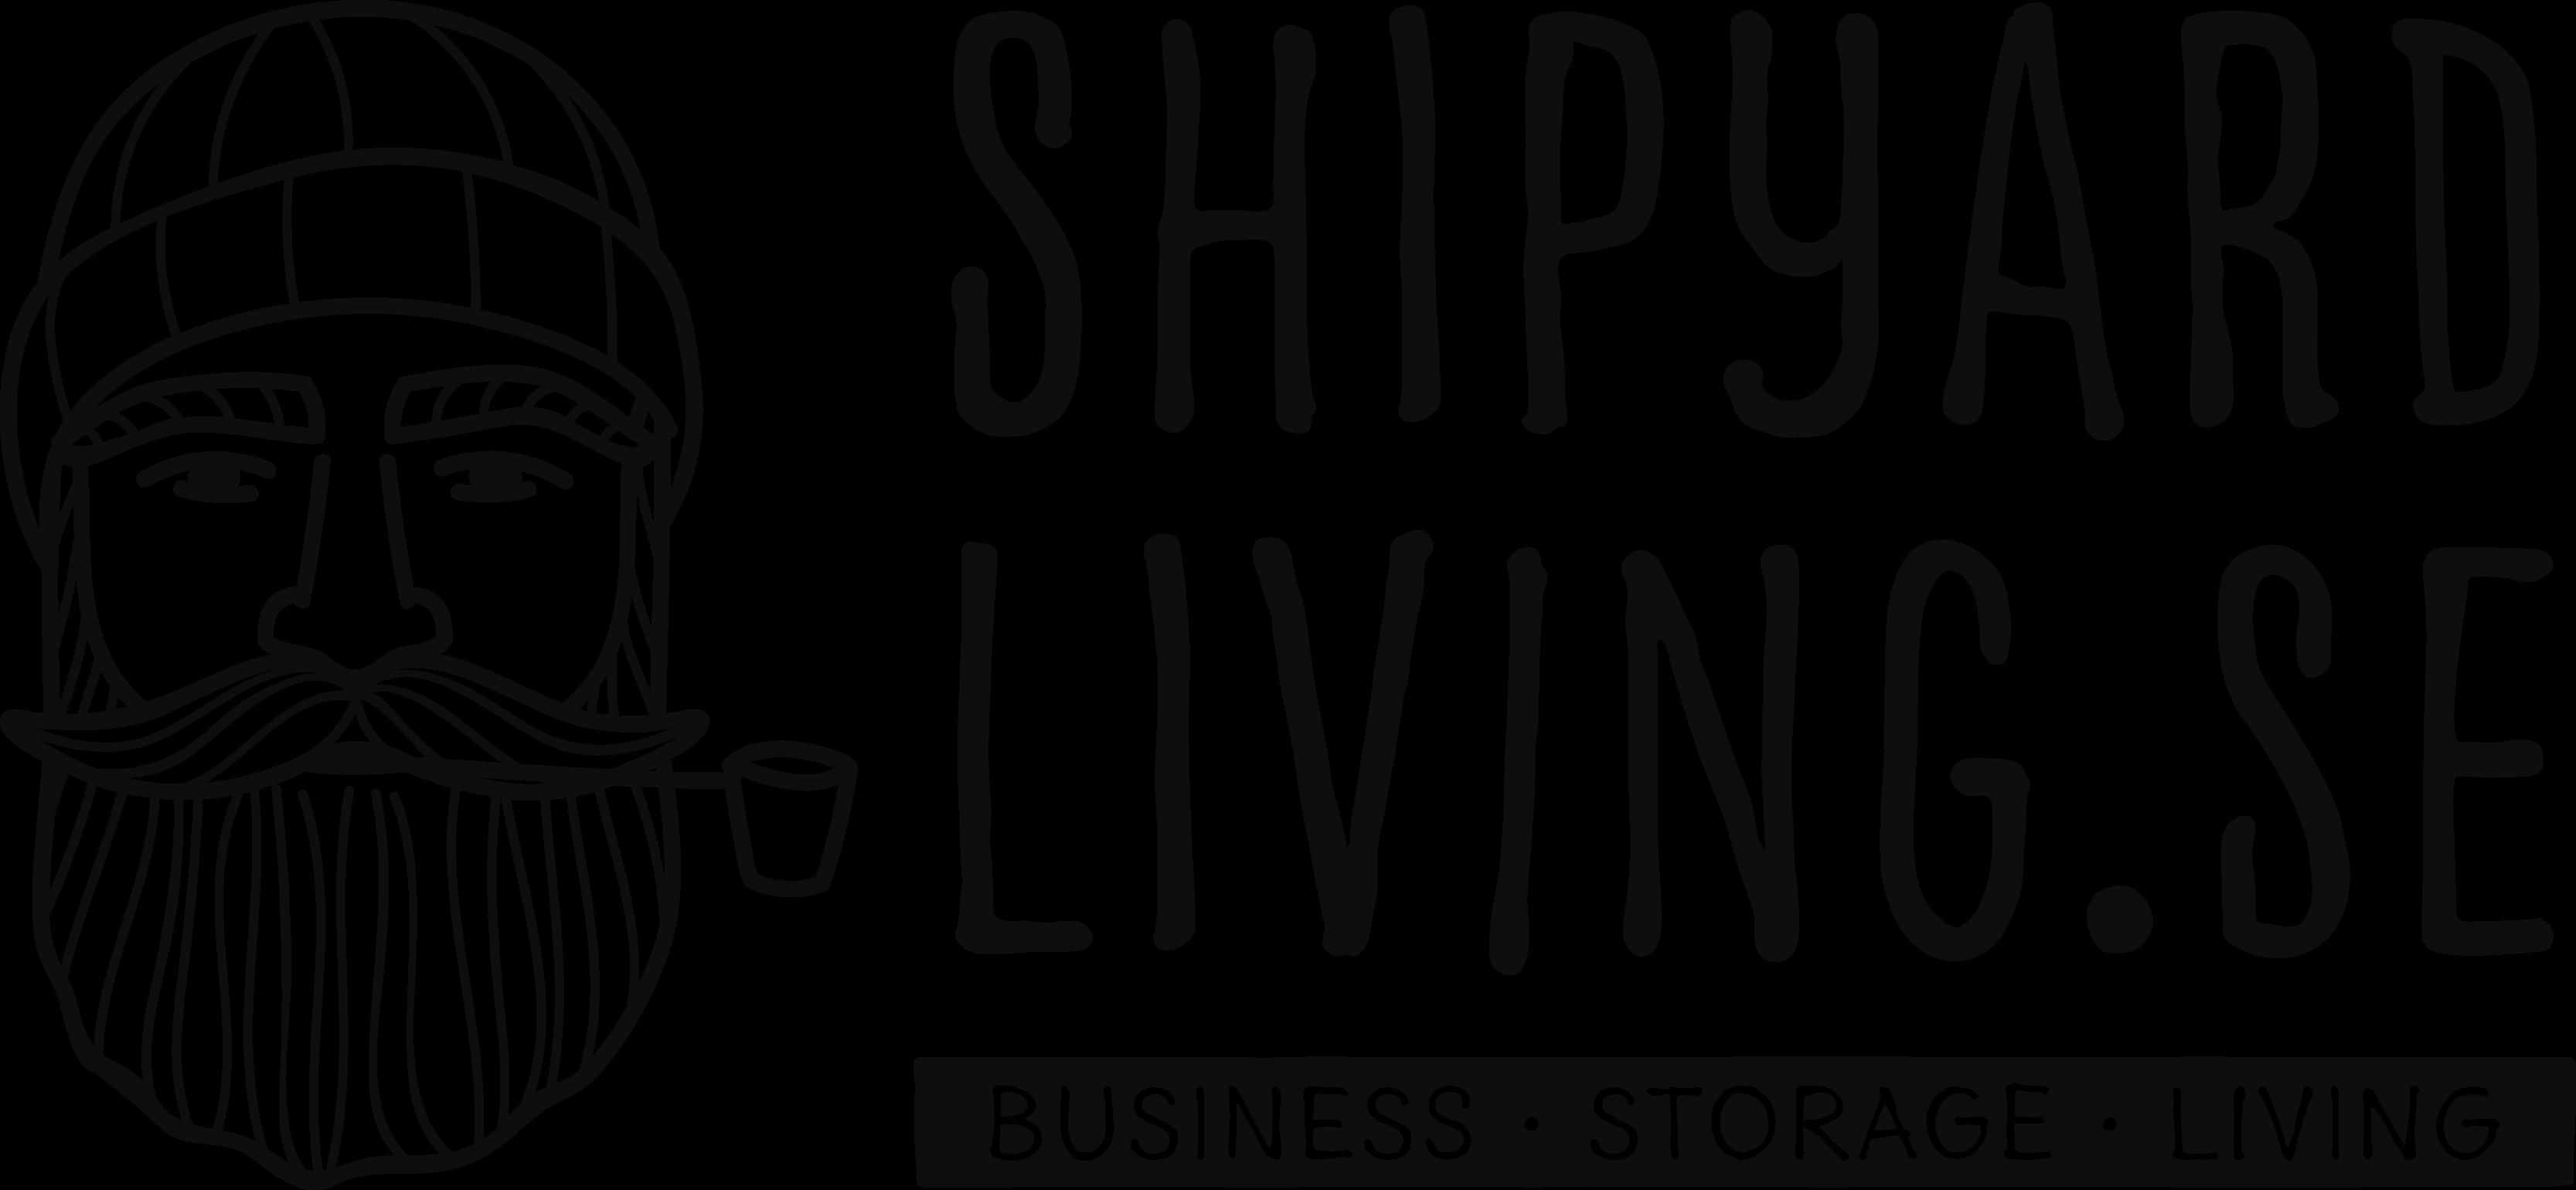 Shipyardliving